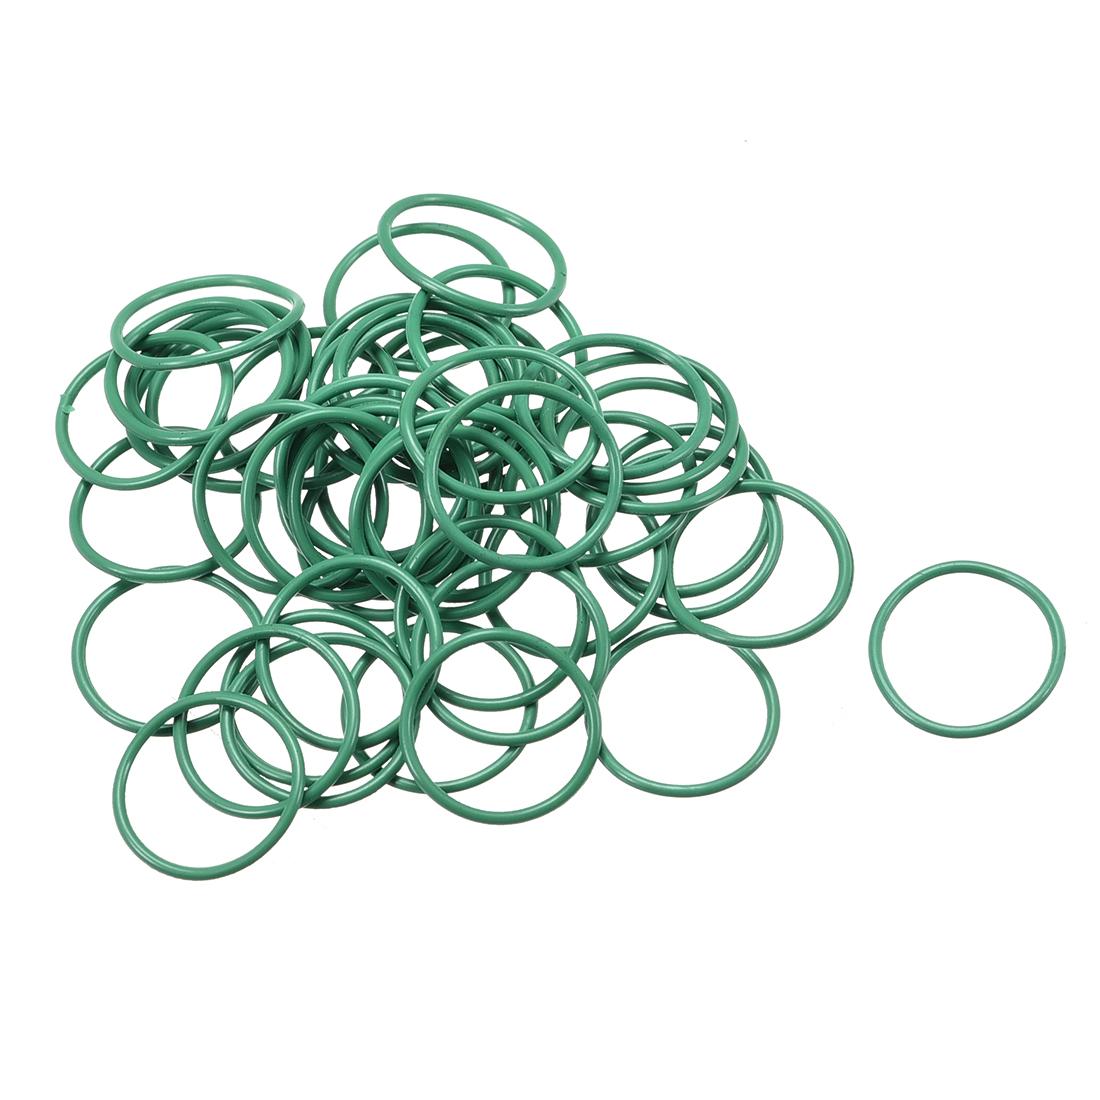 50Pcs Green 12 x 1.5mm Nitrile Rubber O Ring NBR Oil Sealing Grommets